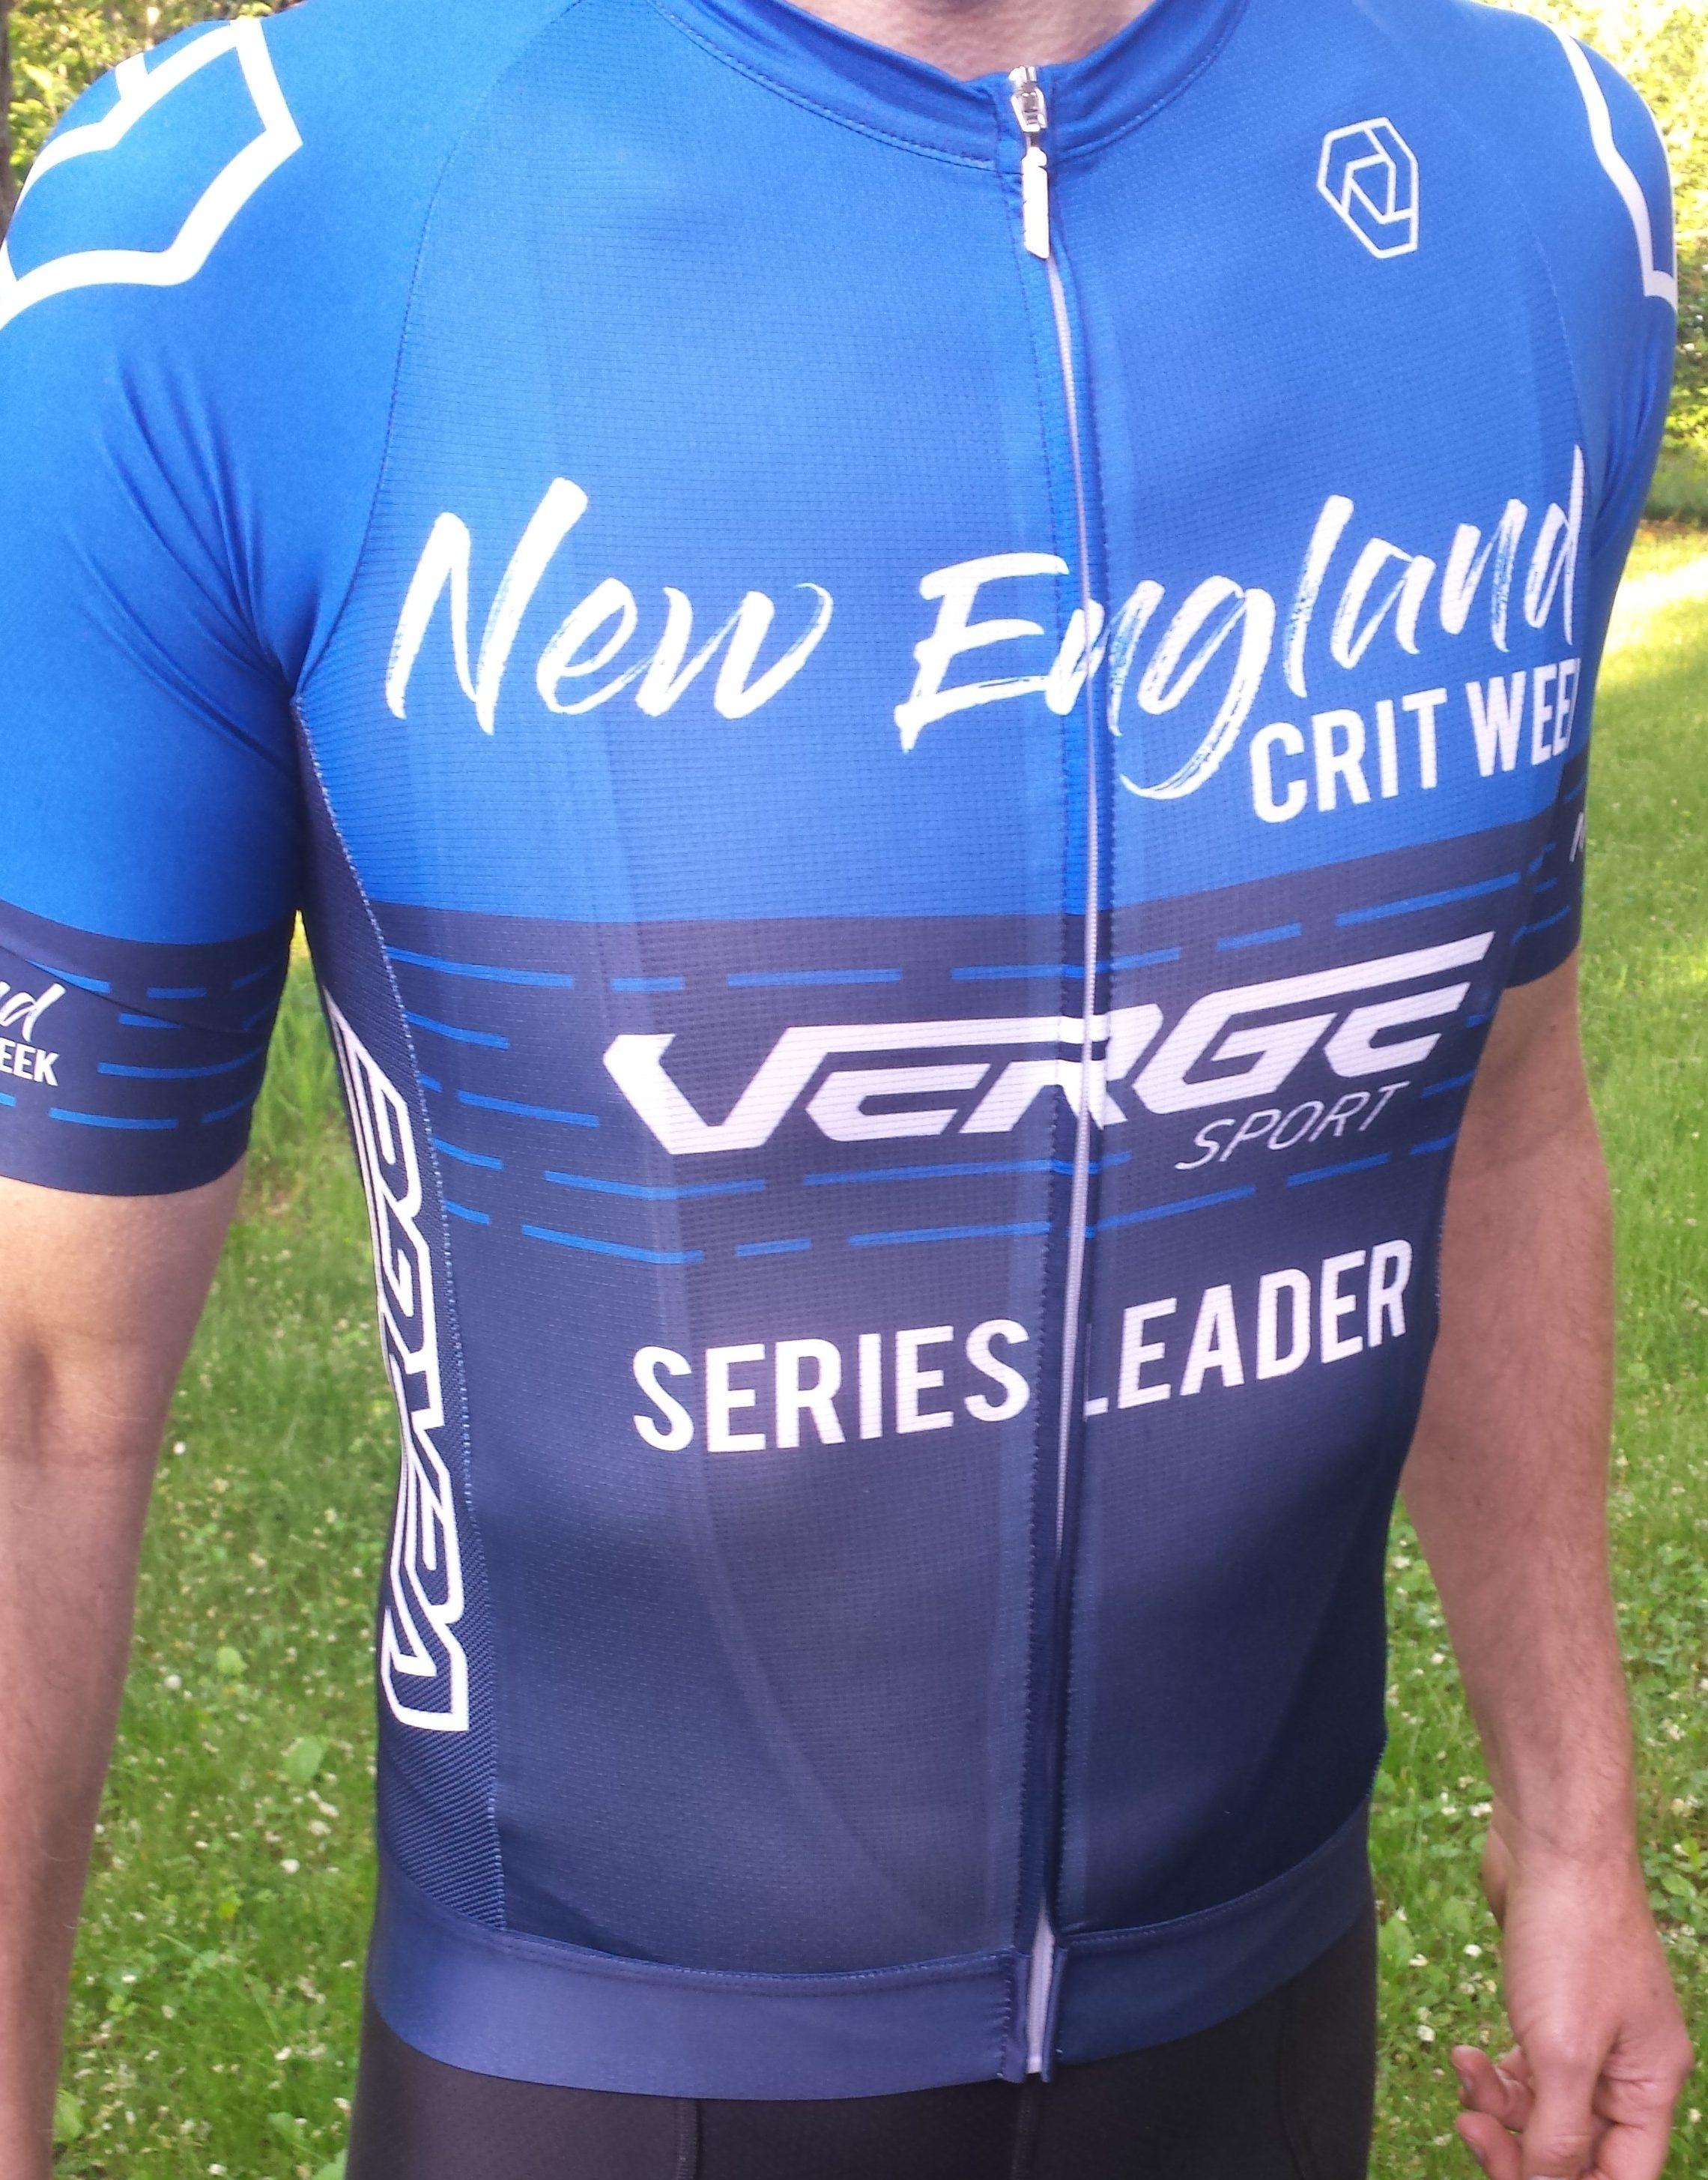 Verge Sport leaders jerseys are in!